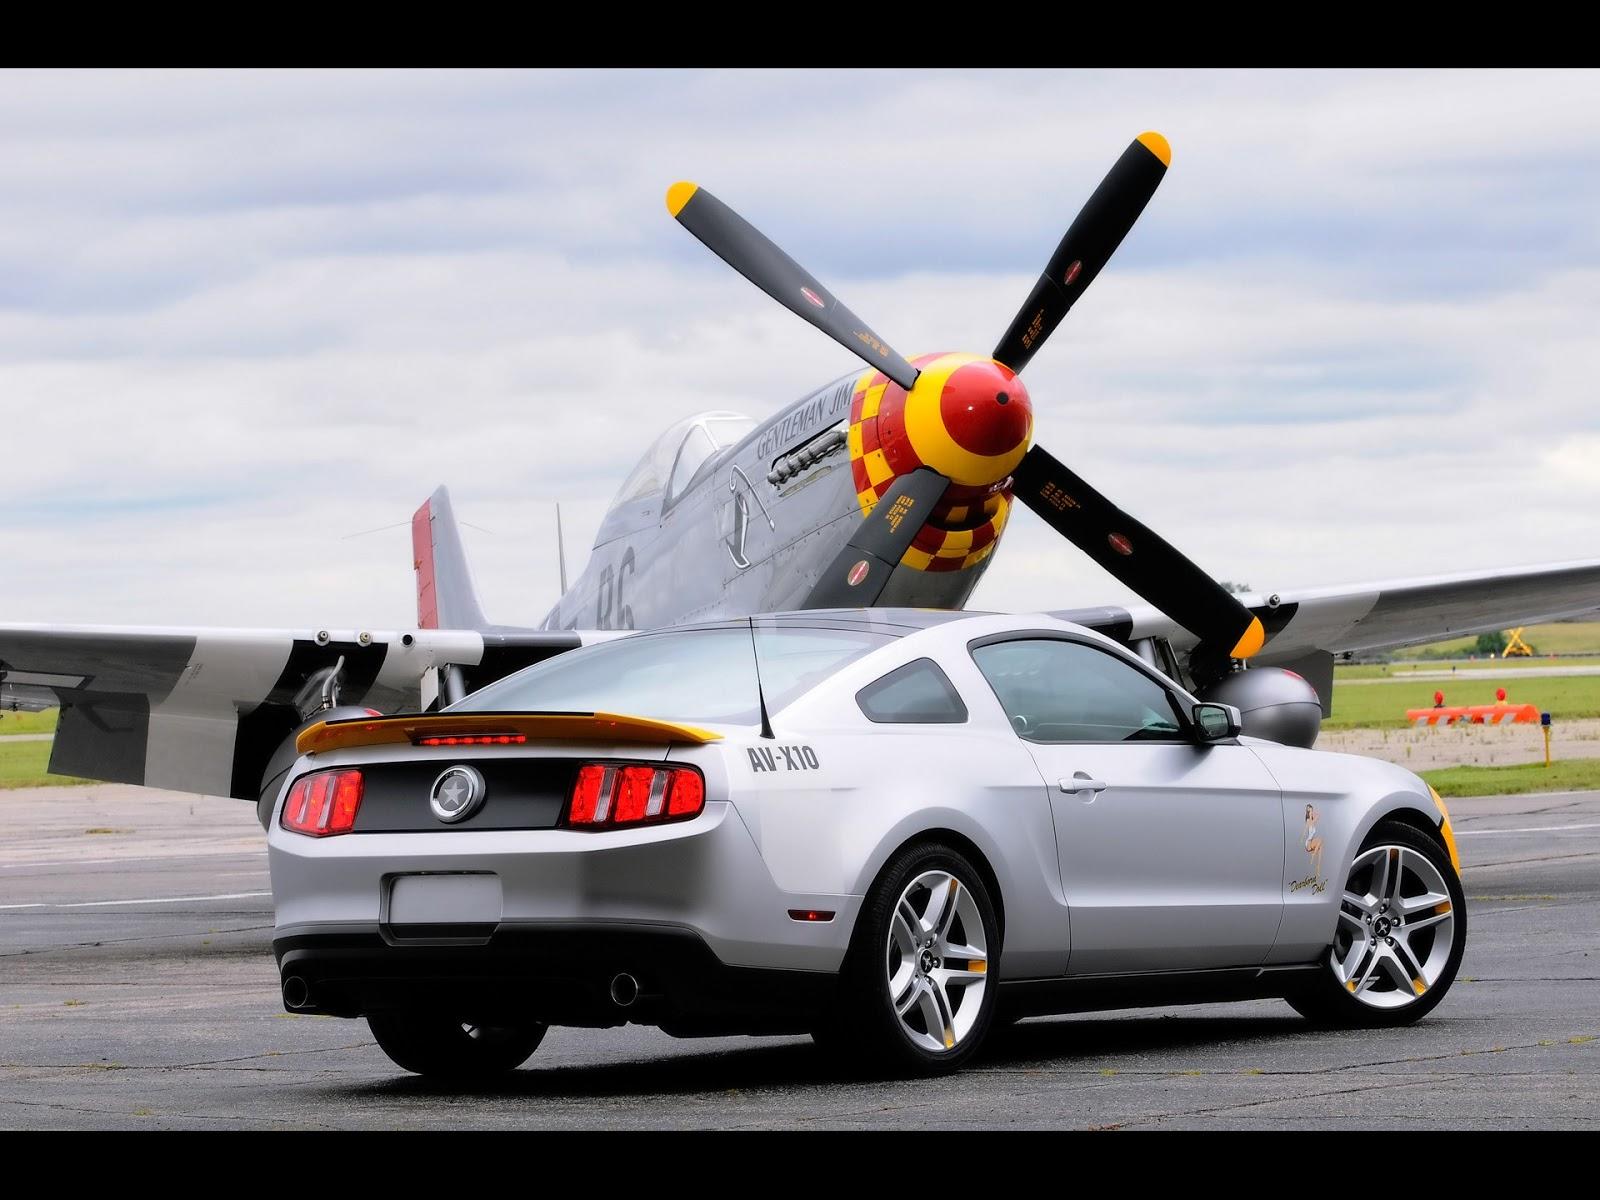 http://4.bp.blogspot.com/-v7bBrTQdskQ/UVROGfdR2mI/AAAAAAAALQw/ABsCNEokXKE/s1600/Ford+Mustang+Muscle+Car+Wallpapers14.jpg